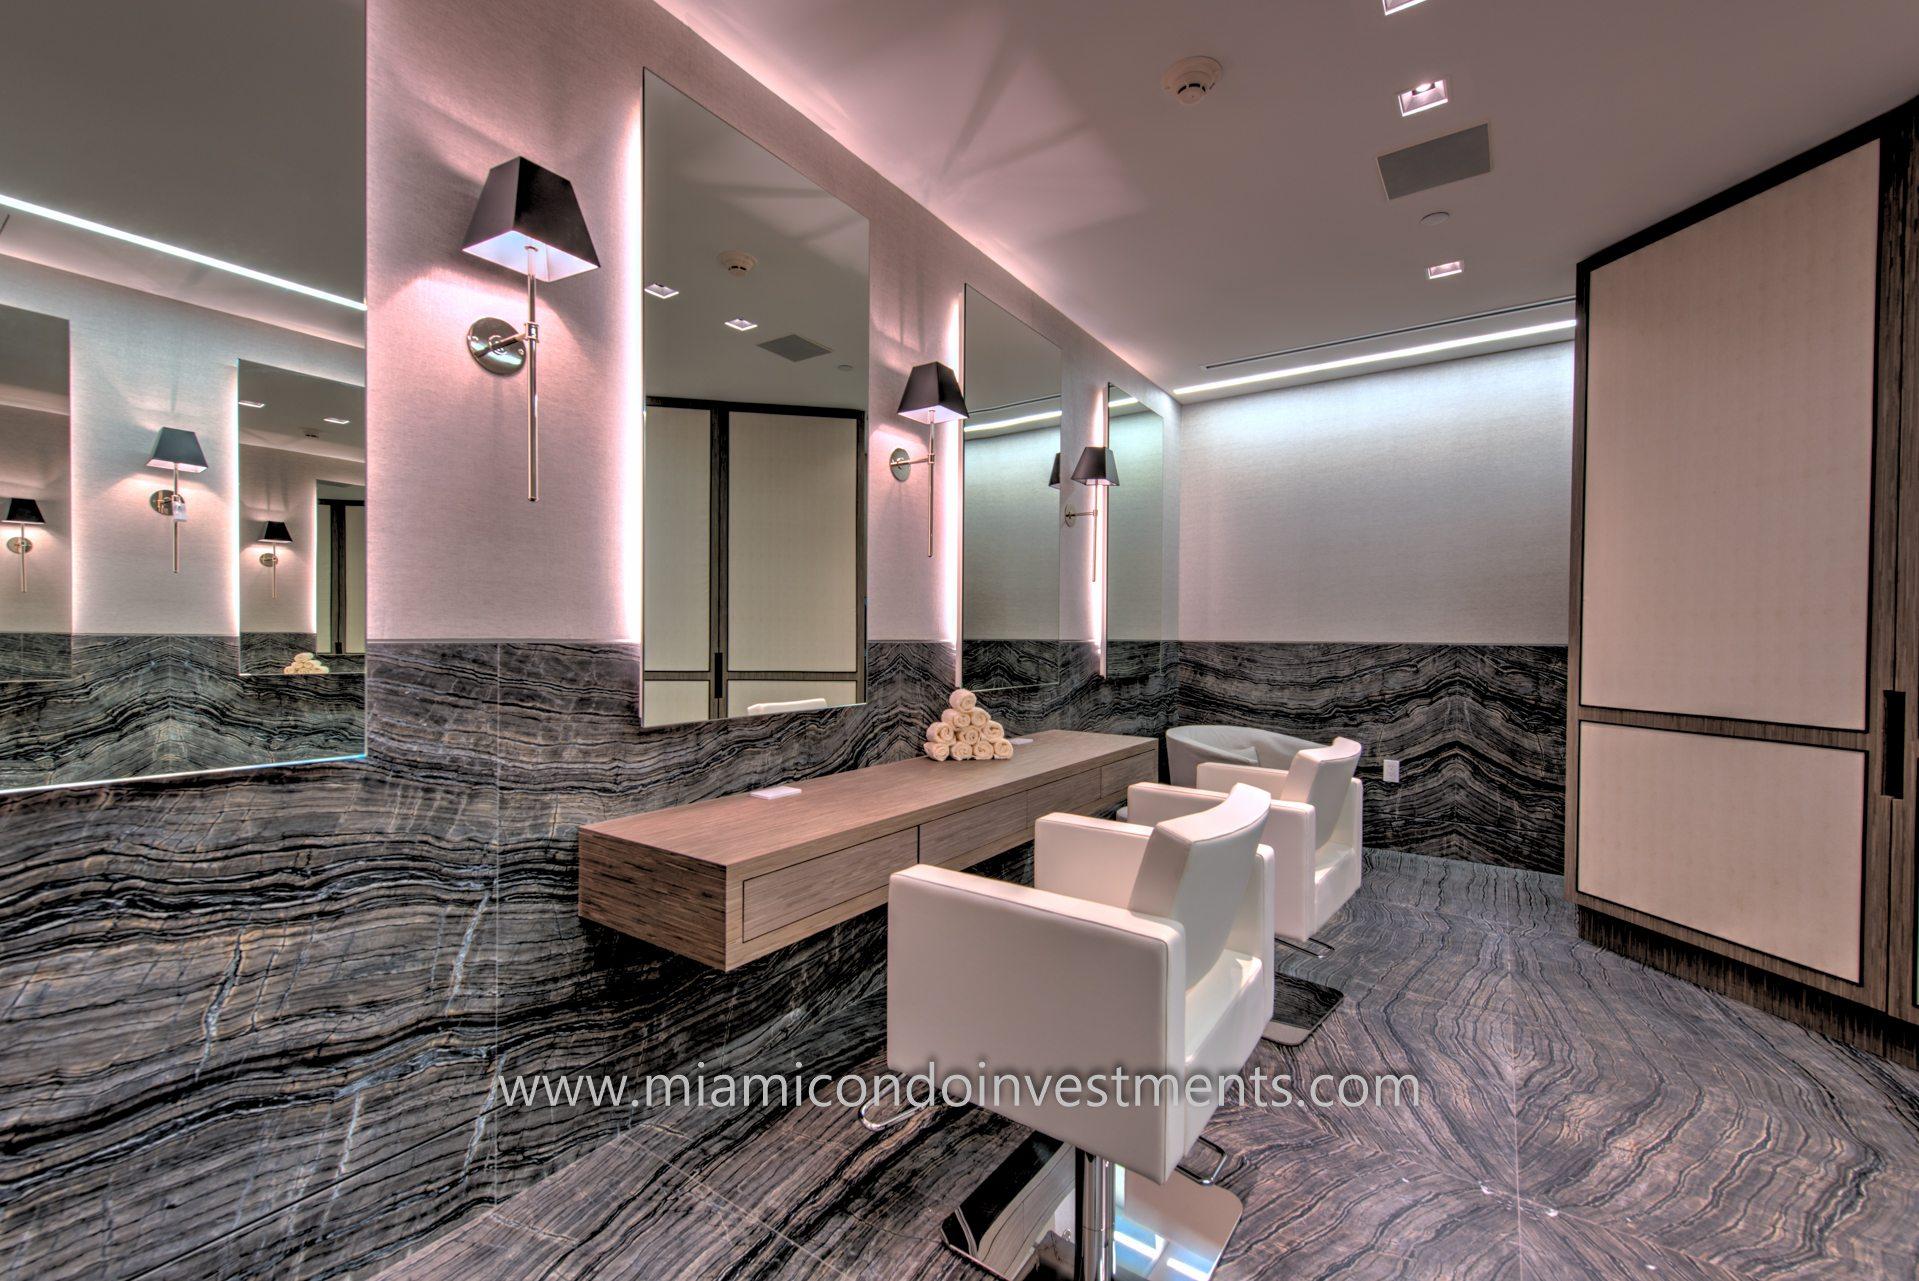 palazzo-del-sol-amenities-common-areas-20